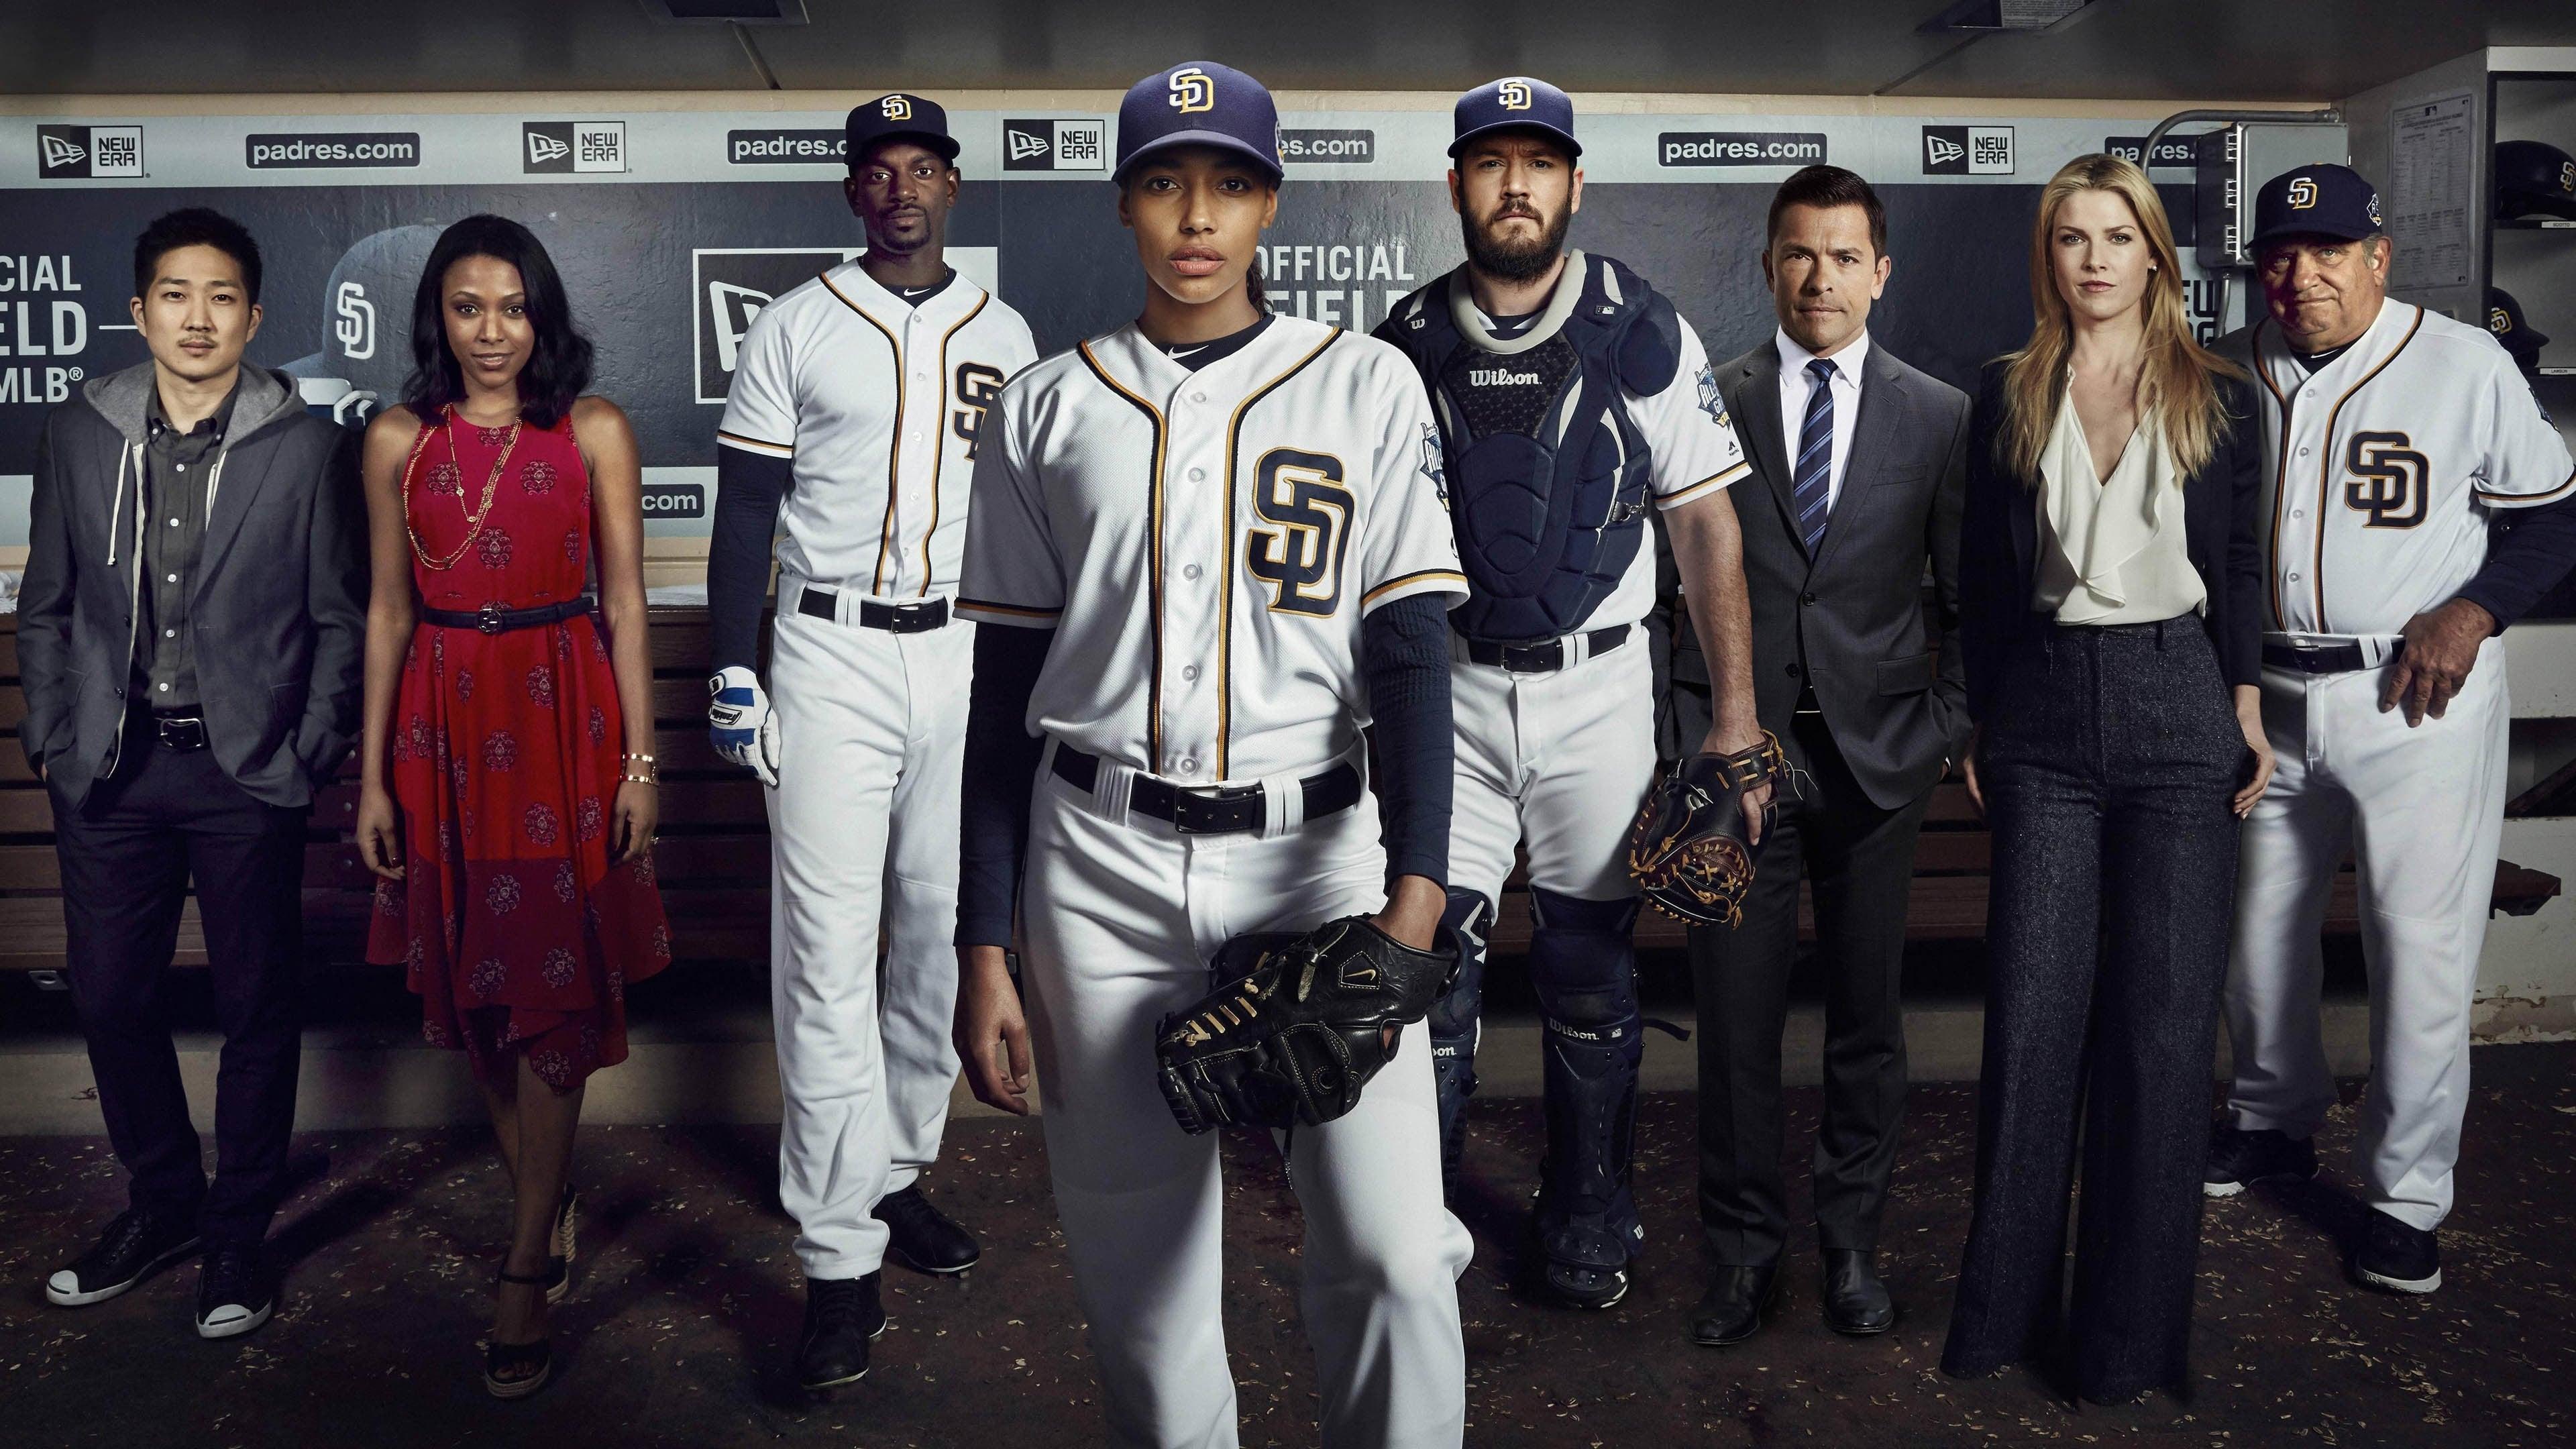 Geen homerun voor Pitch, FOX cancelt de honkbalserie